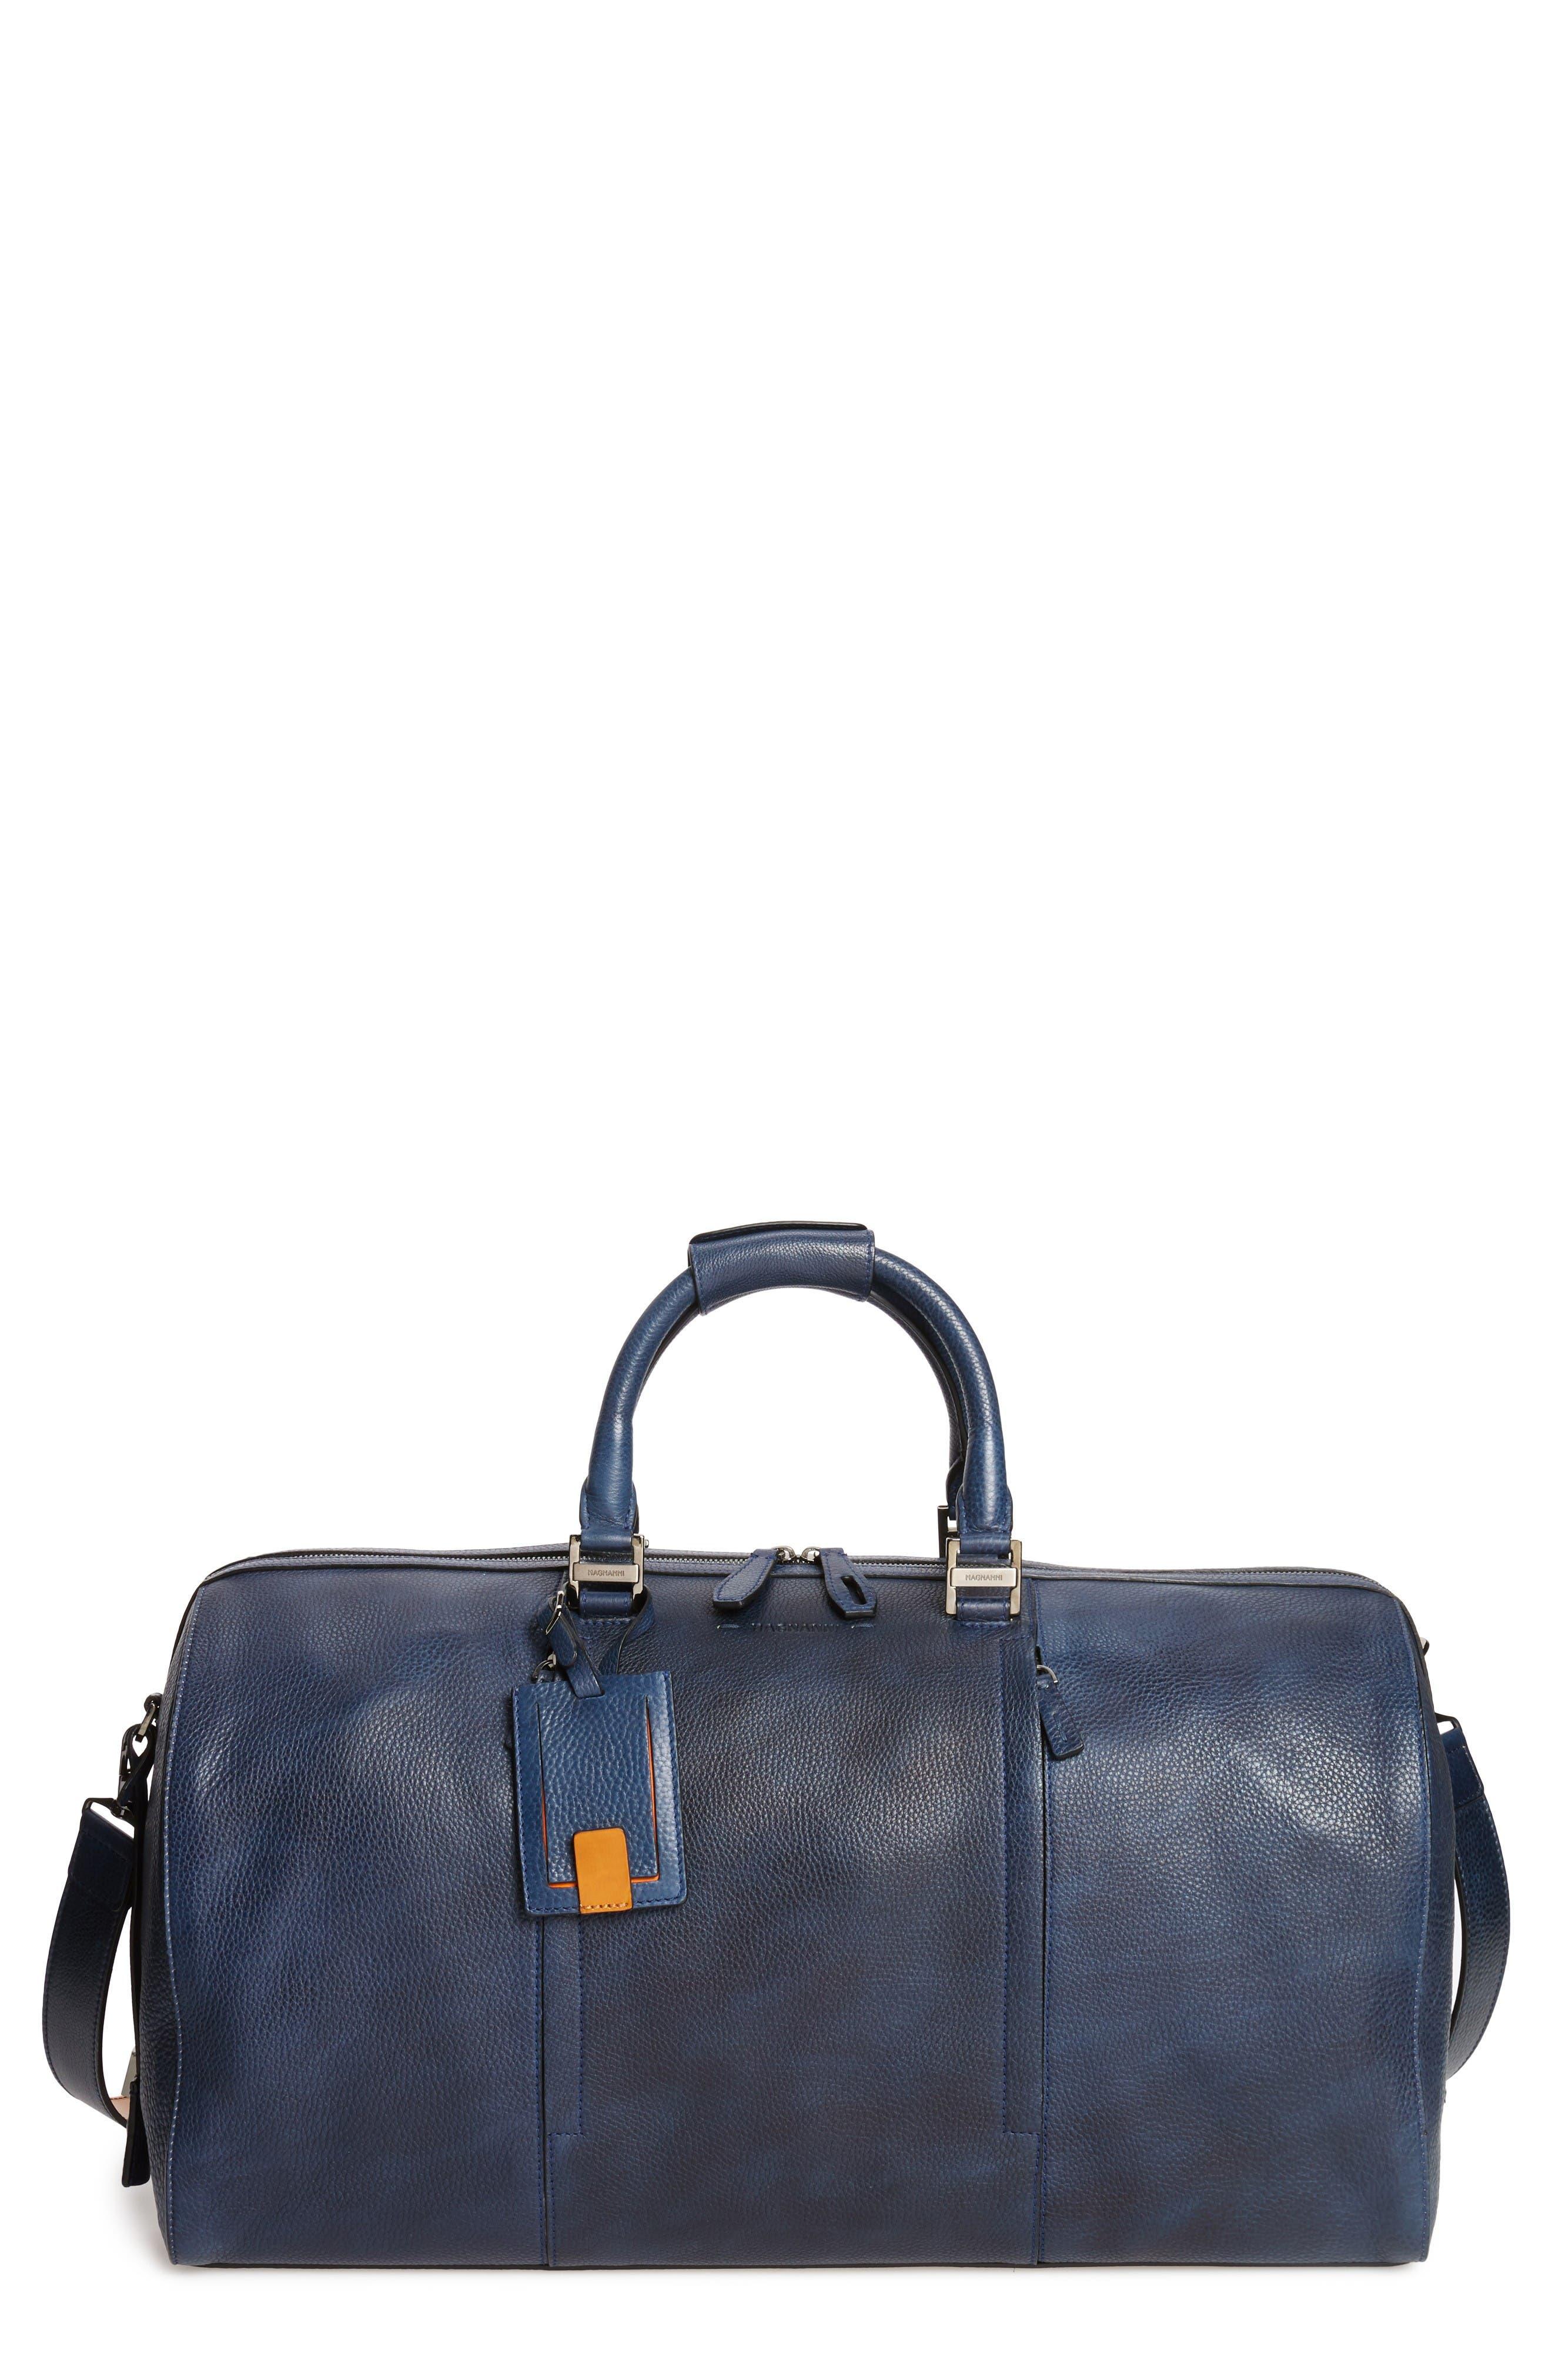 Alternate Image 1 Selected - Magnanni Traveler Leather Duffel Bag